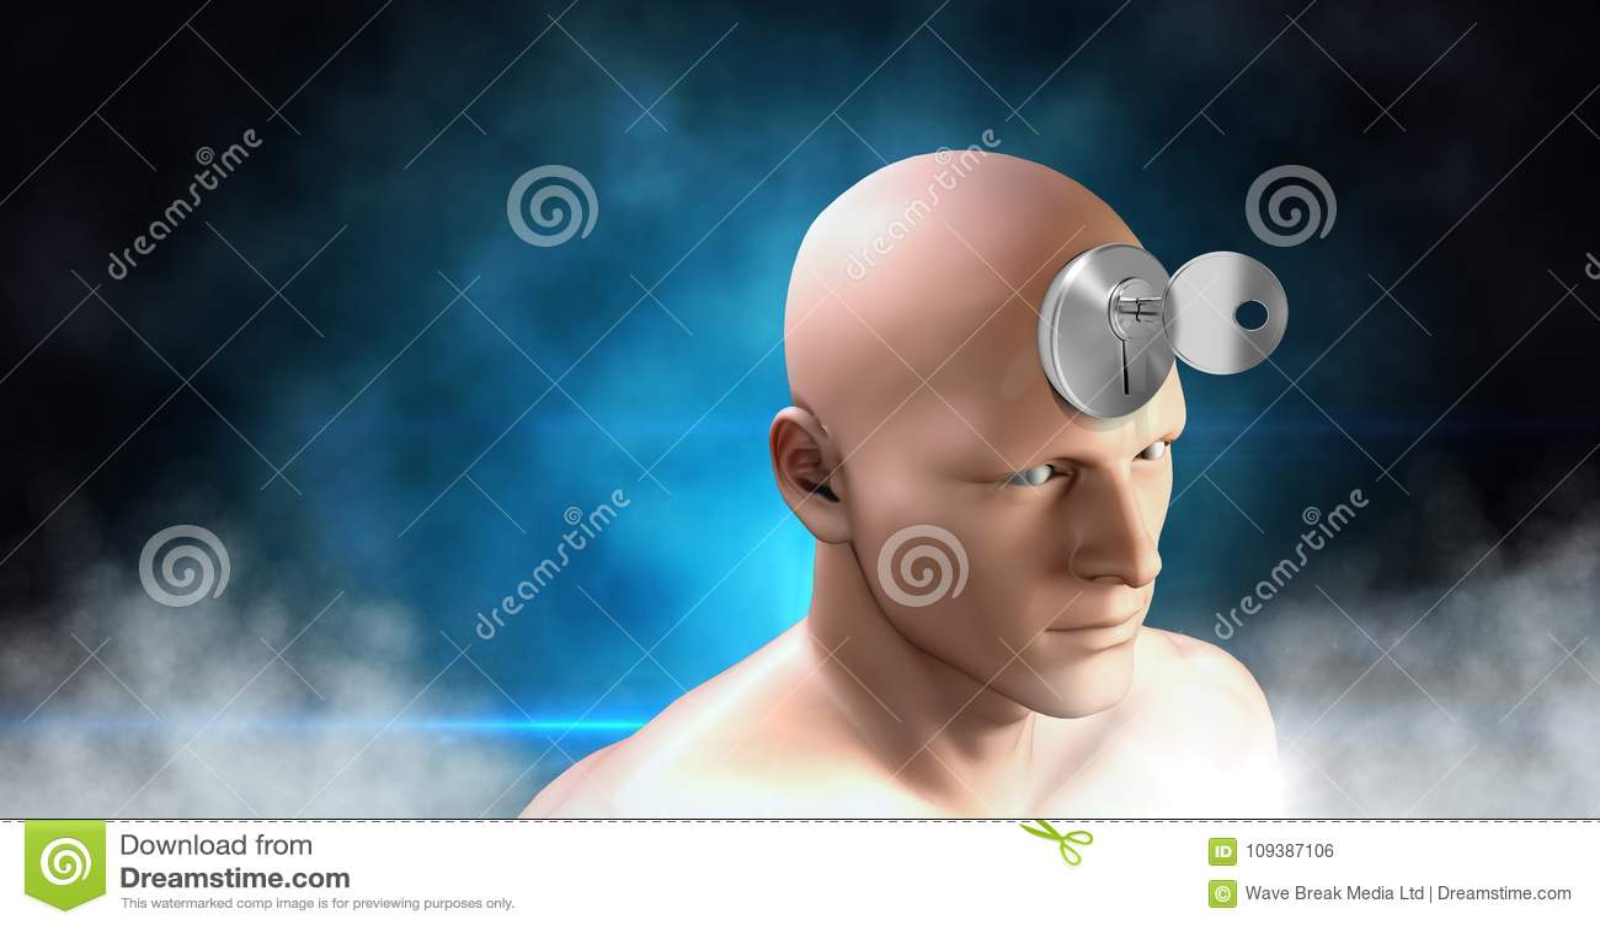 Key Unlocking The Surreal Imagination Of 3D Mans Head Stock